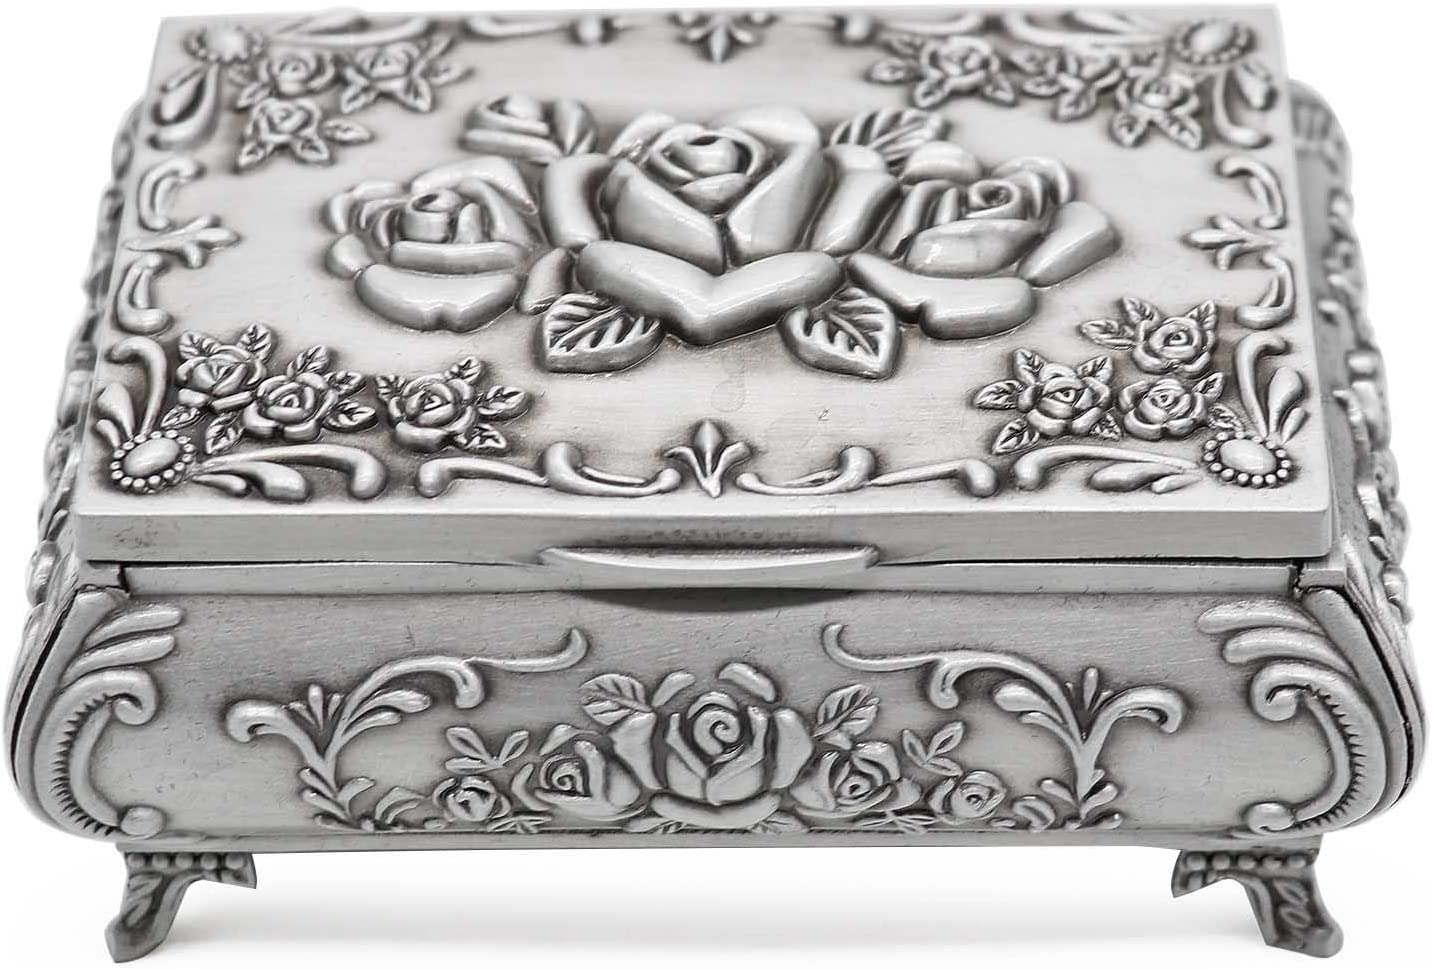 AVESON Rectangle Vintage Metal Jewelry Box Trinket Storage Organizer Gift Box Chest Ring Case with Rose Pattern for Girls Ladies Women, Medium